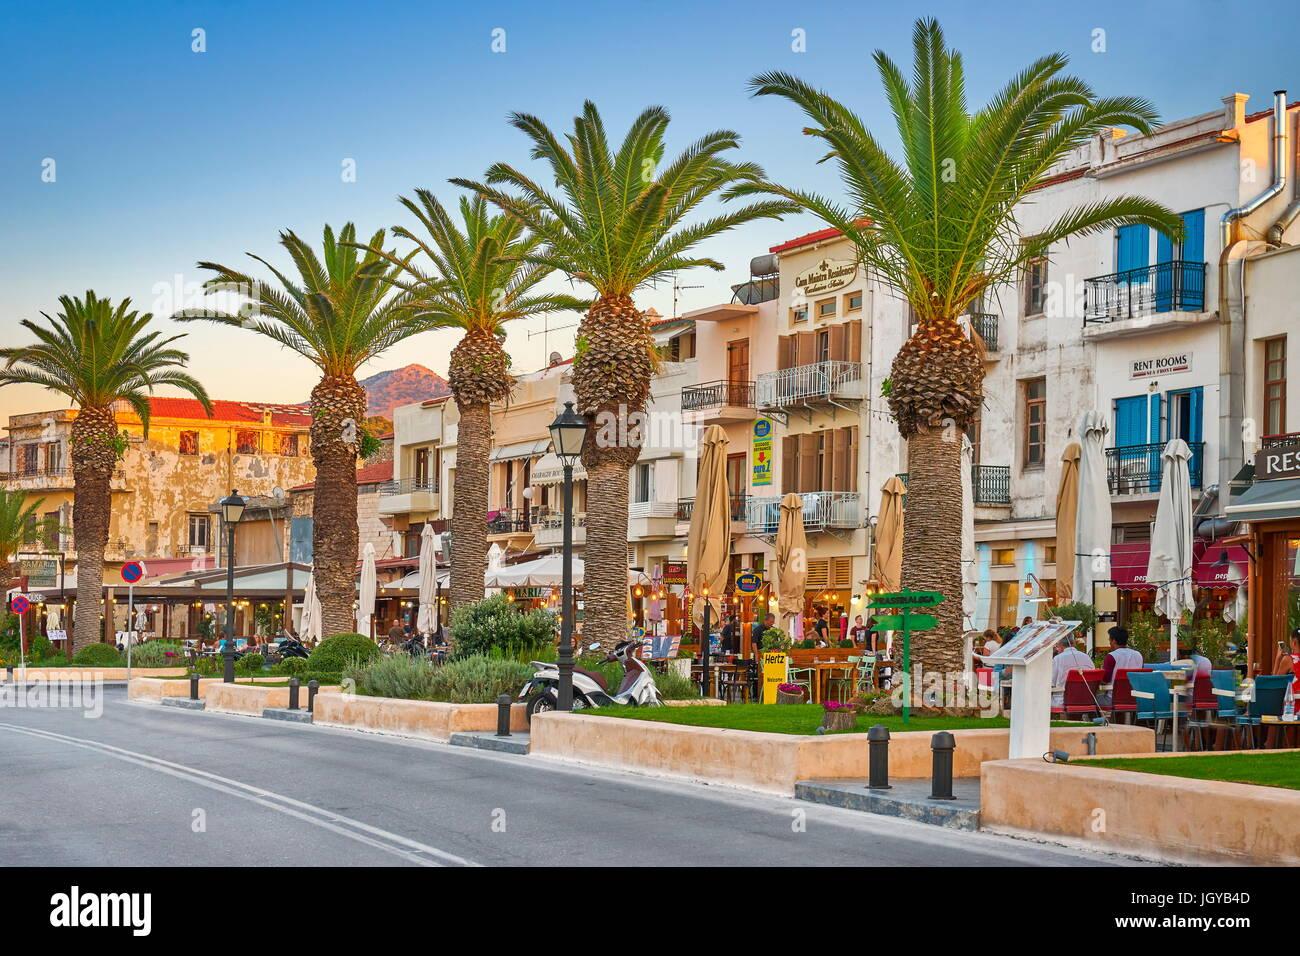 Alte Stadt Promenade, Rethymno, Kreta, Griechenland Stockbild